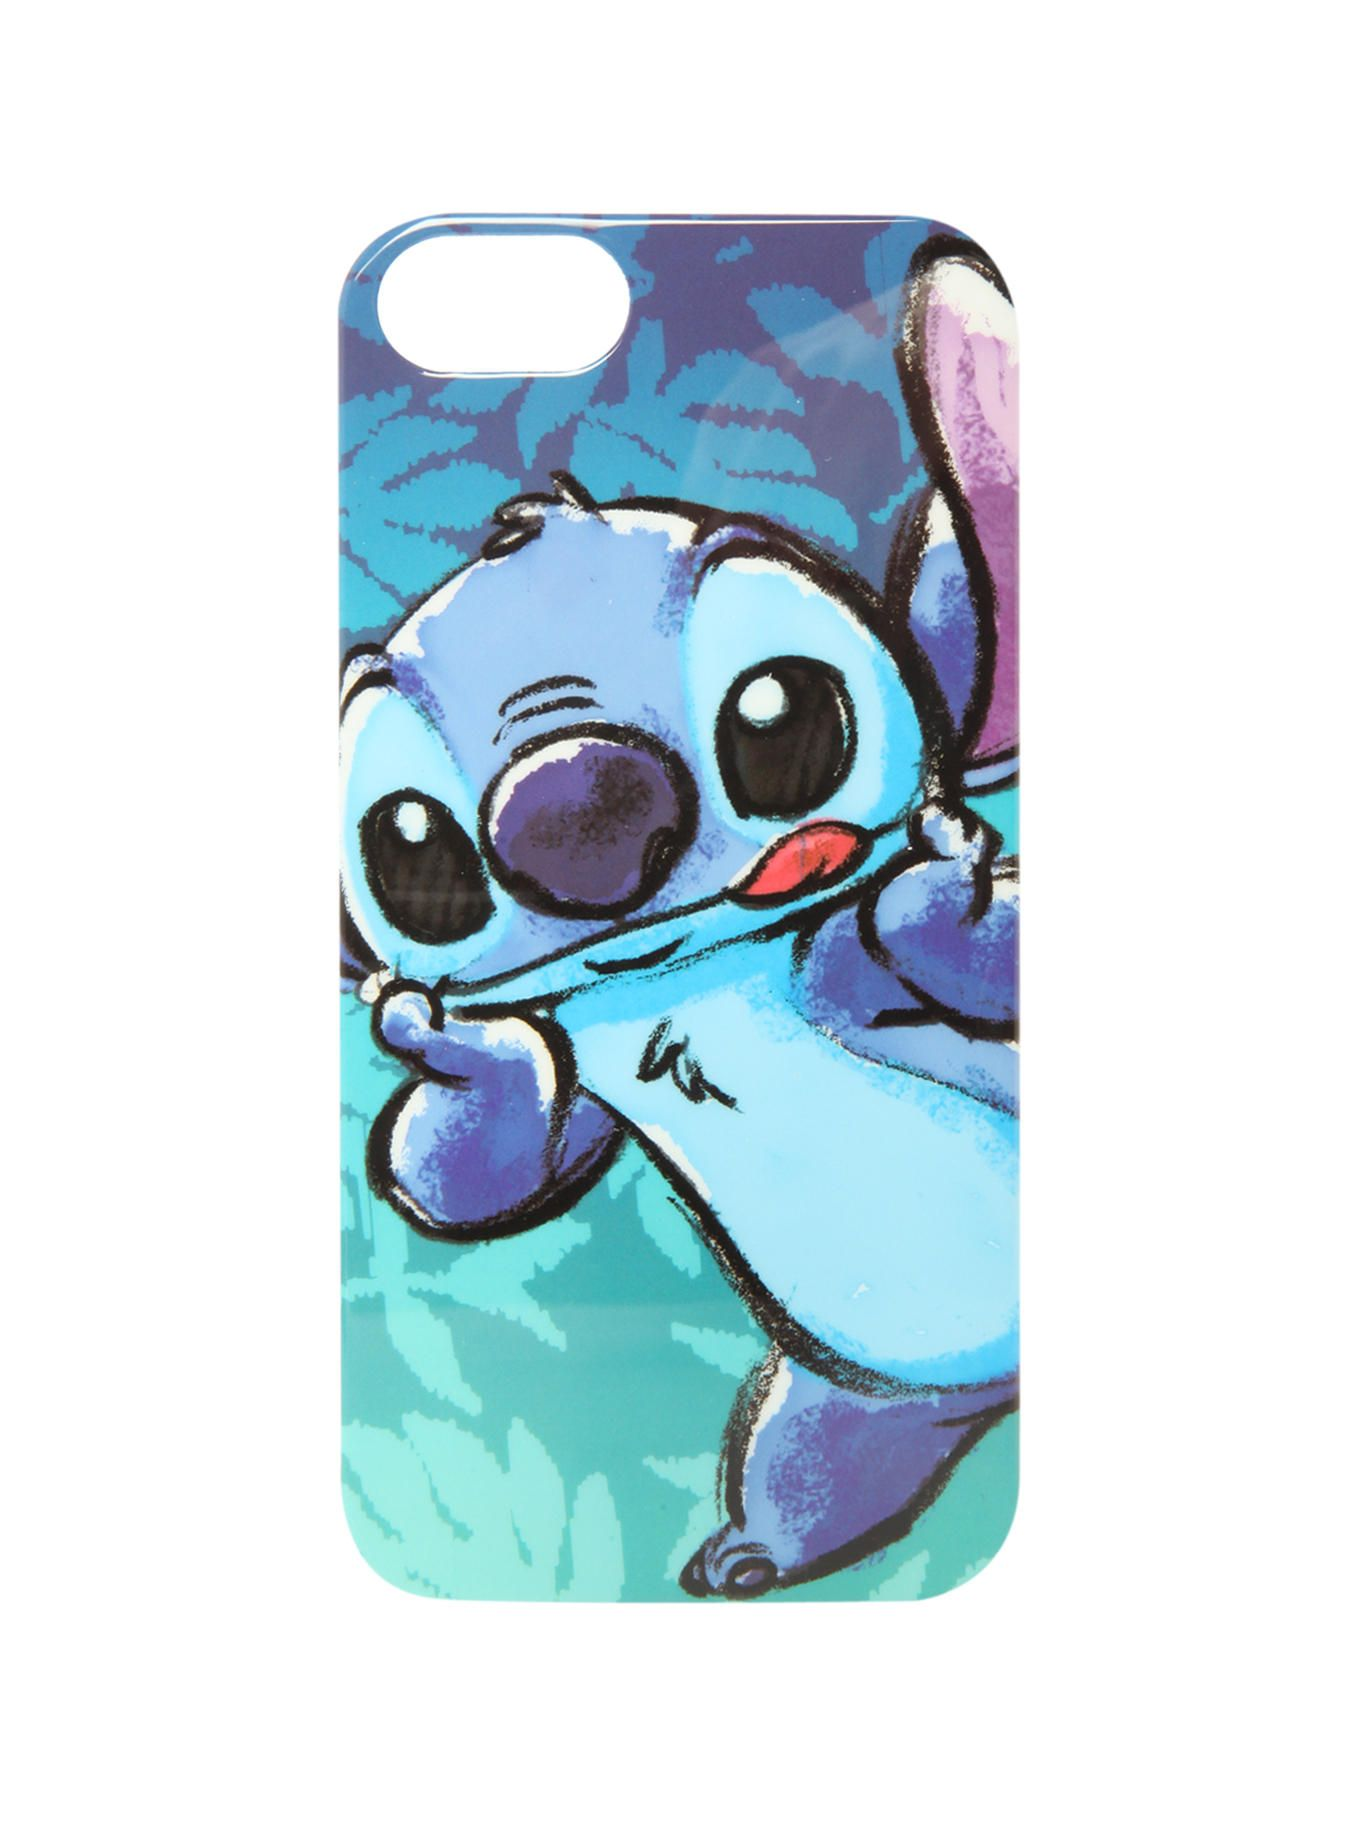 5738cf717e4 Disney Lilo Stitch Sketch iPhone 5/5S Case from Hot Topic. Saved to iPhone  Cases. #love #case #phone #stitch #lilo #disney.